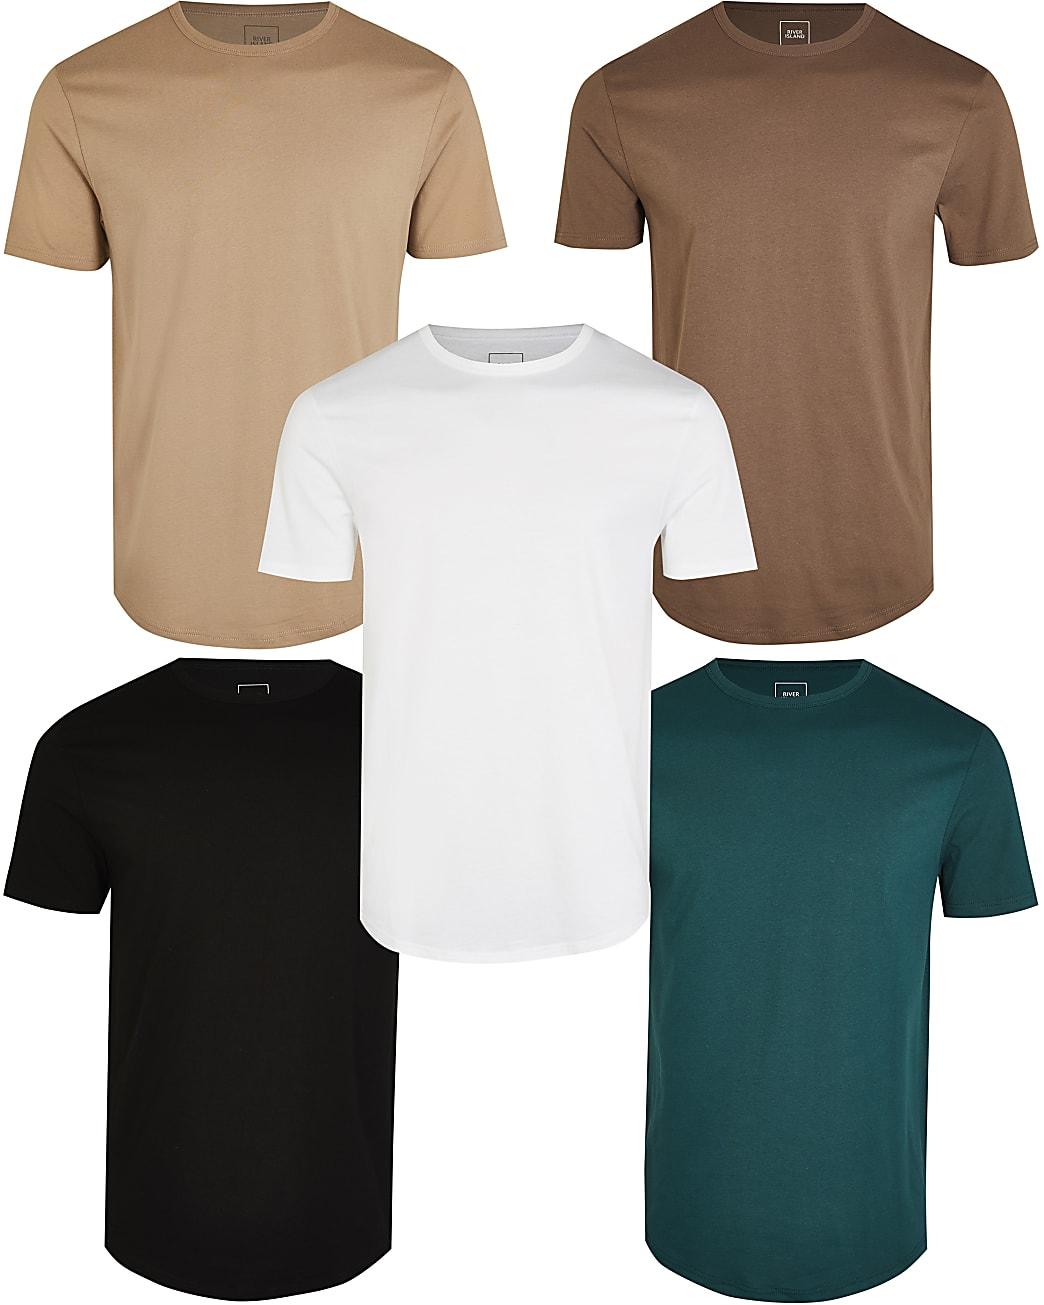 Brown slim double curve hem t-shirt 5 pack